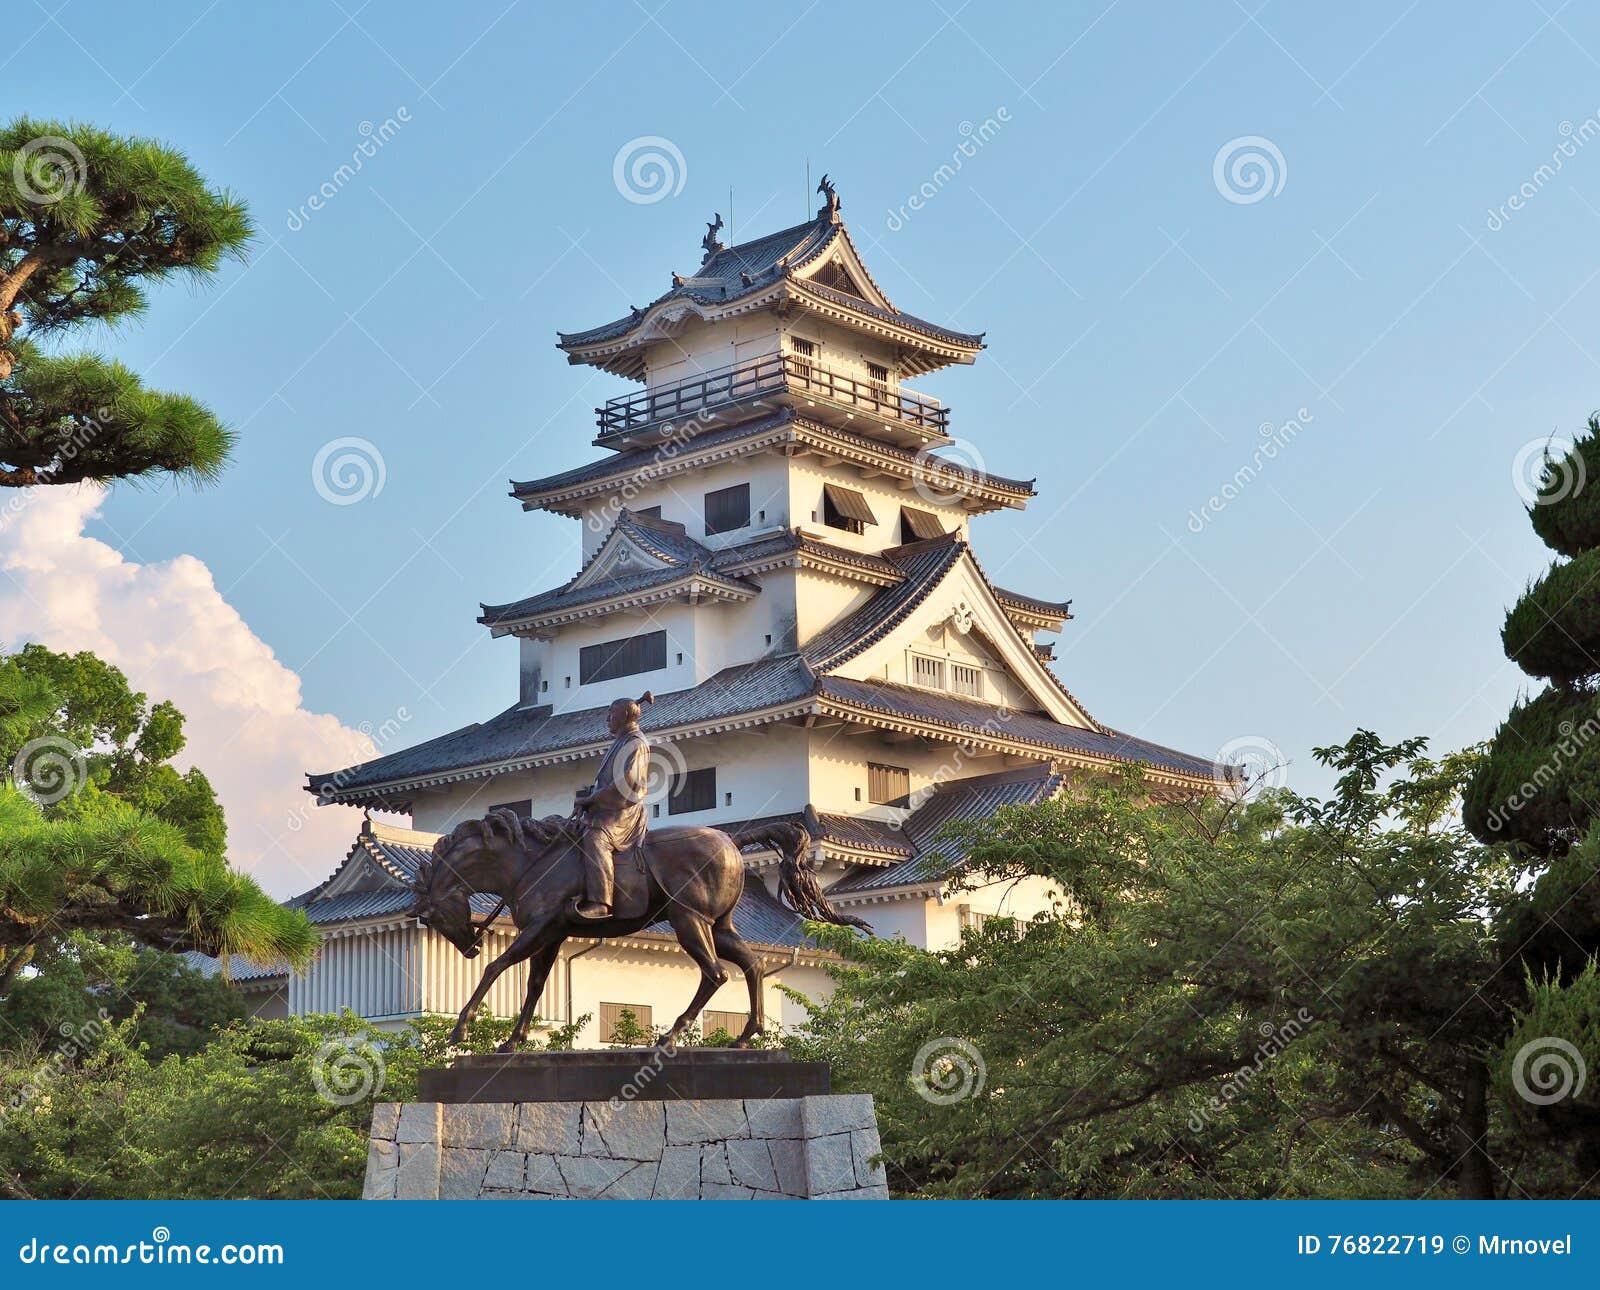 Imabarikasteel in Imabari, Japan